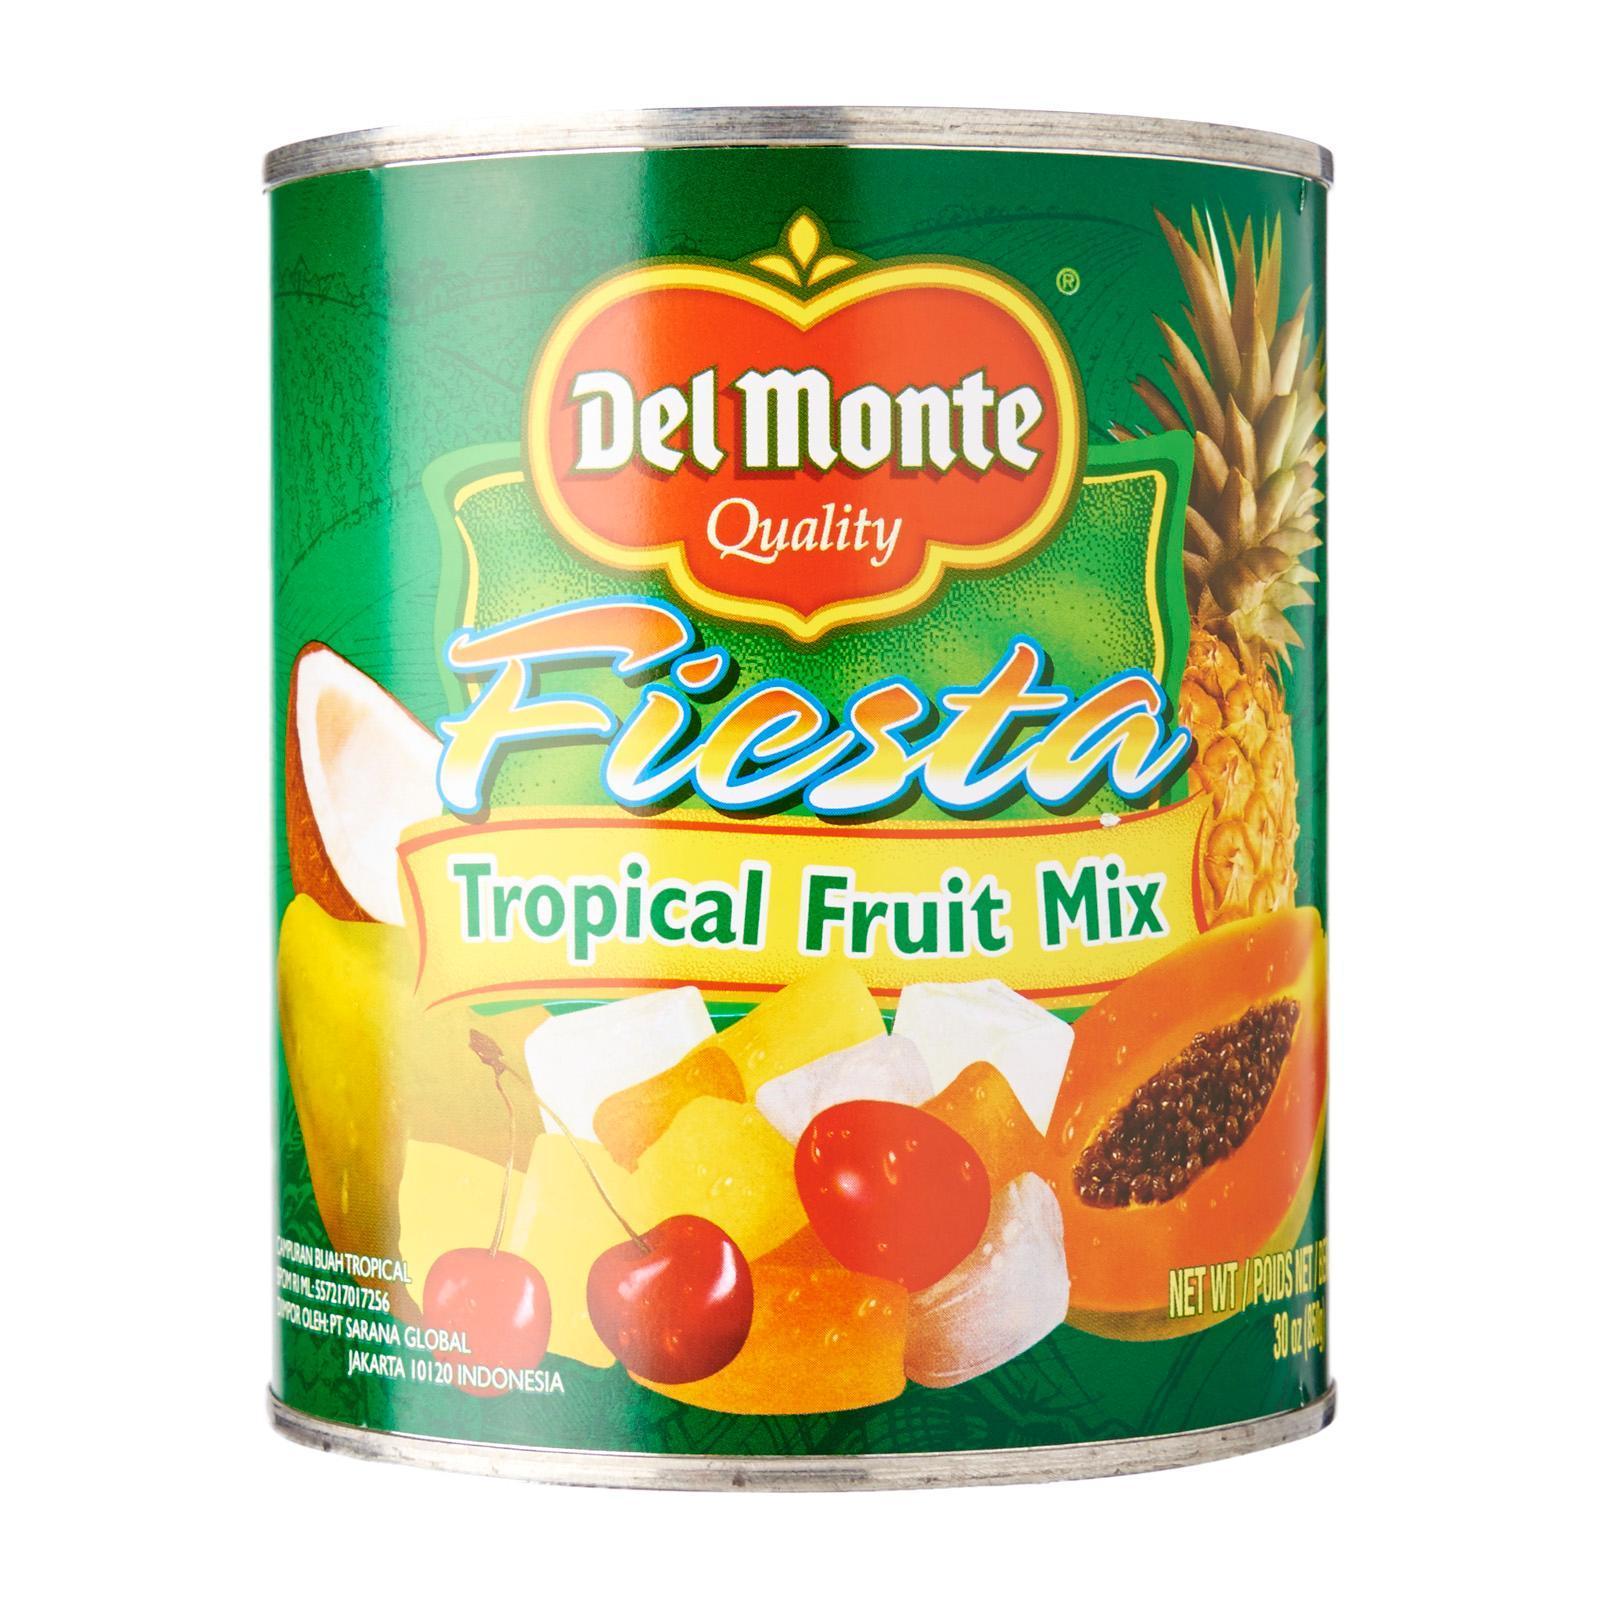 Del Monte Fiesta Tropical Fruit Mix